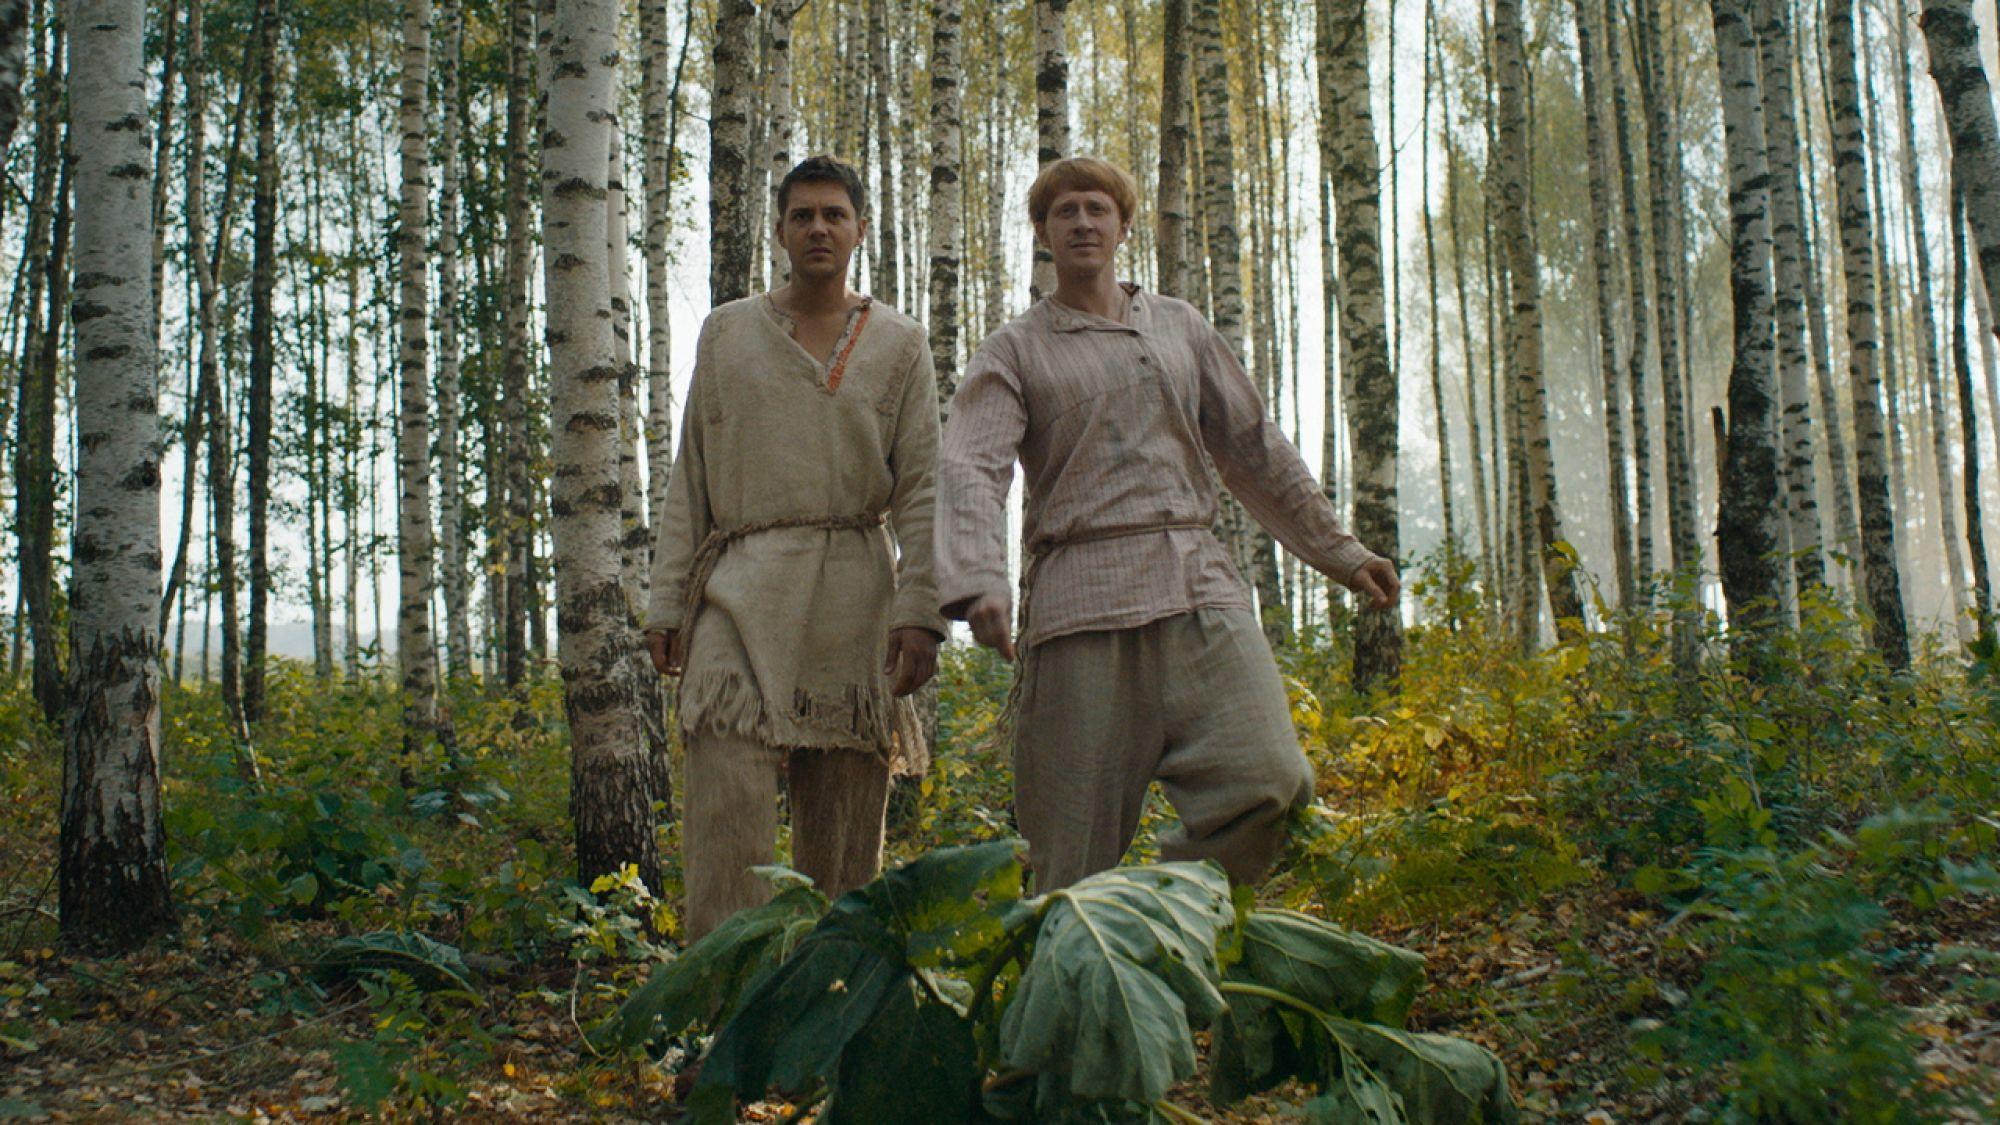 Онлайн-кинотеатр Okko эксклюзивно покажет комедию «Холоп»